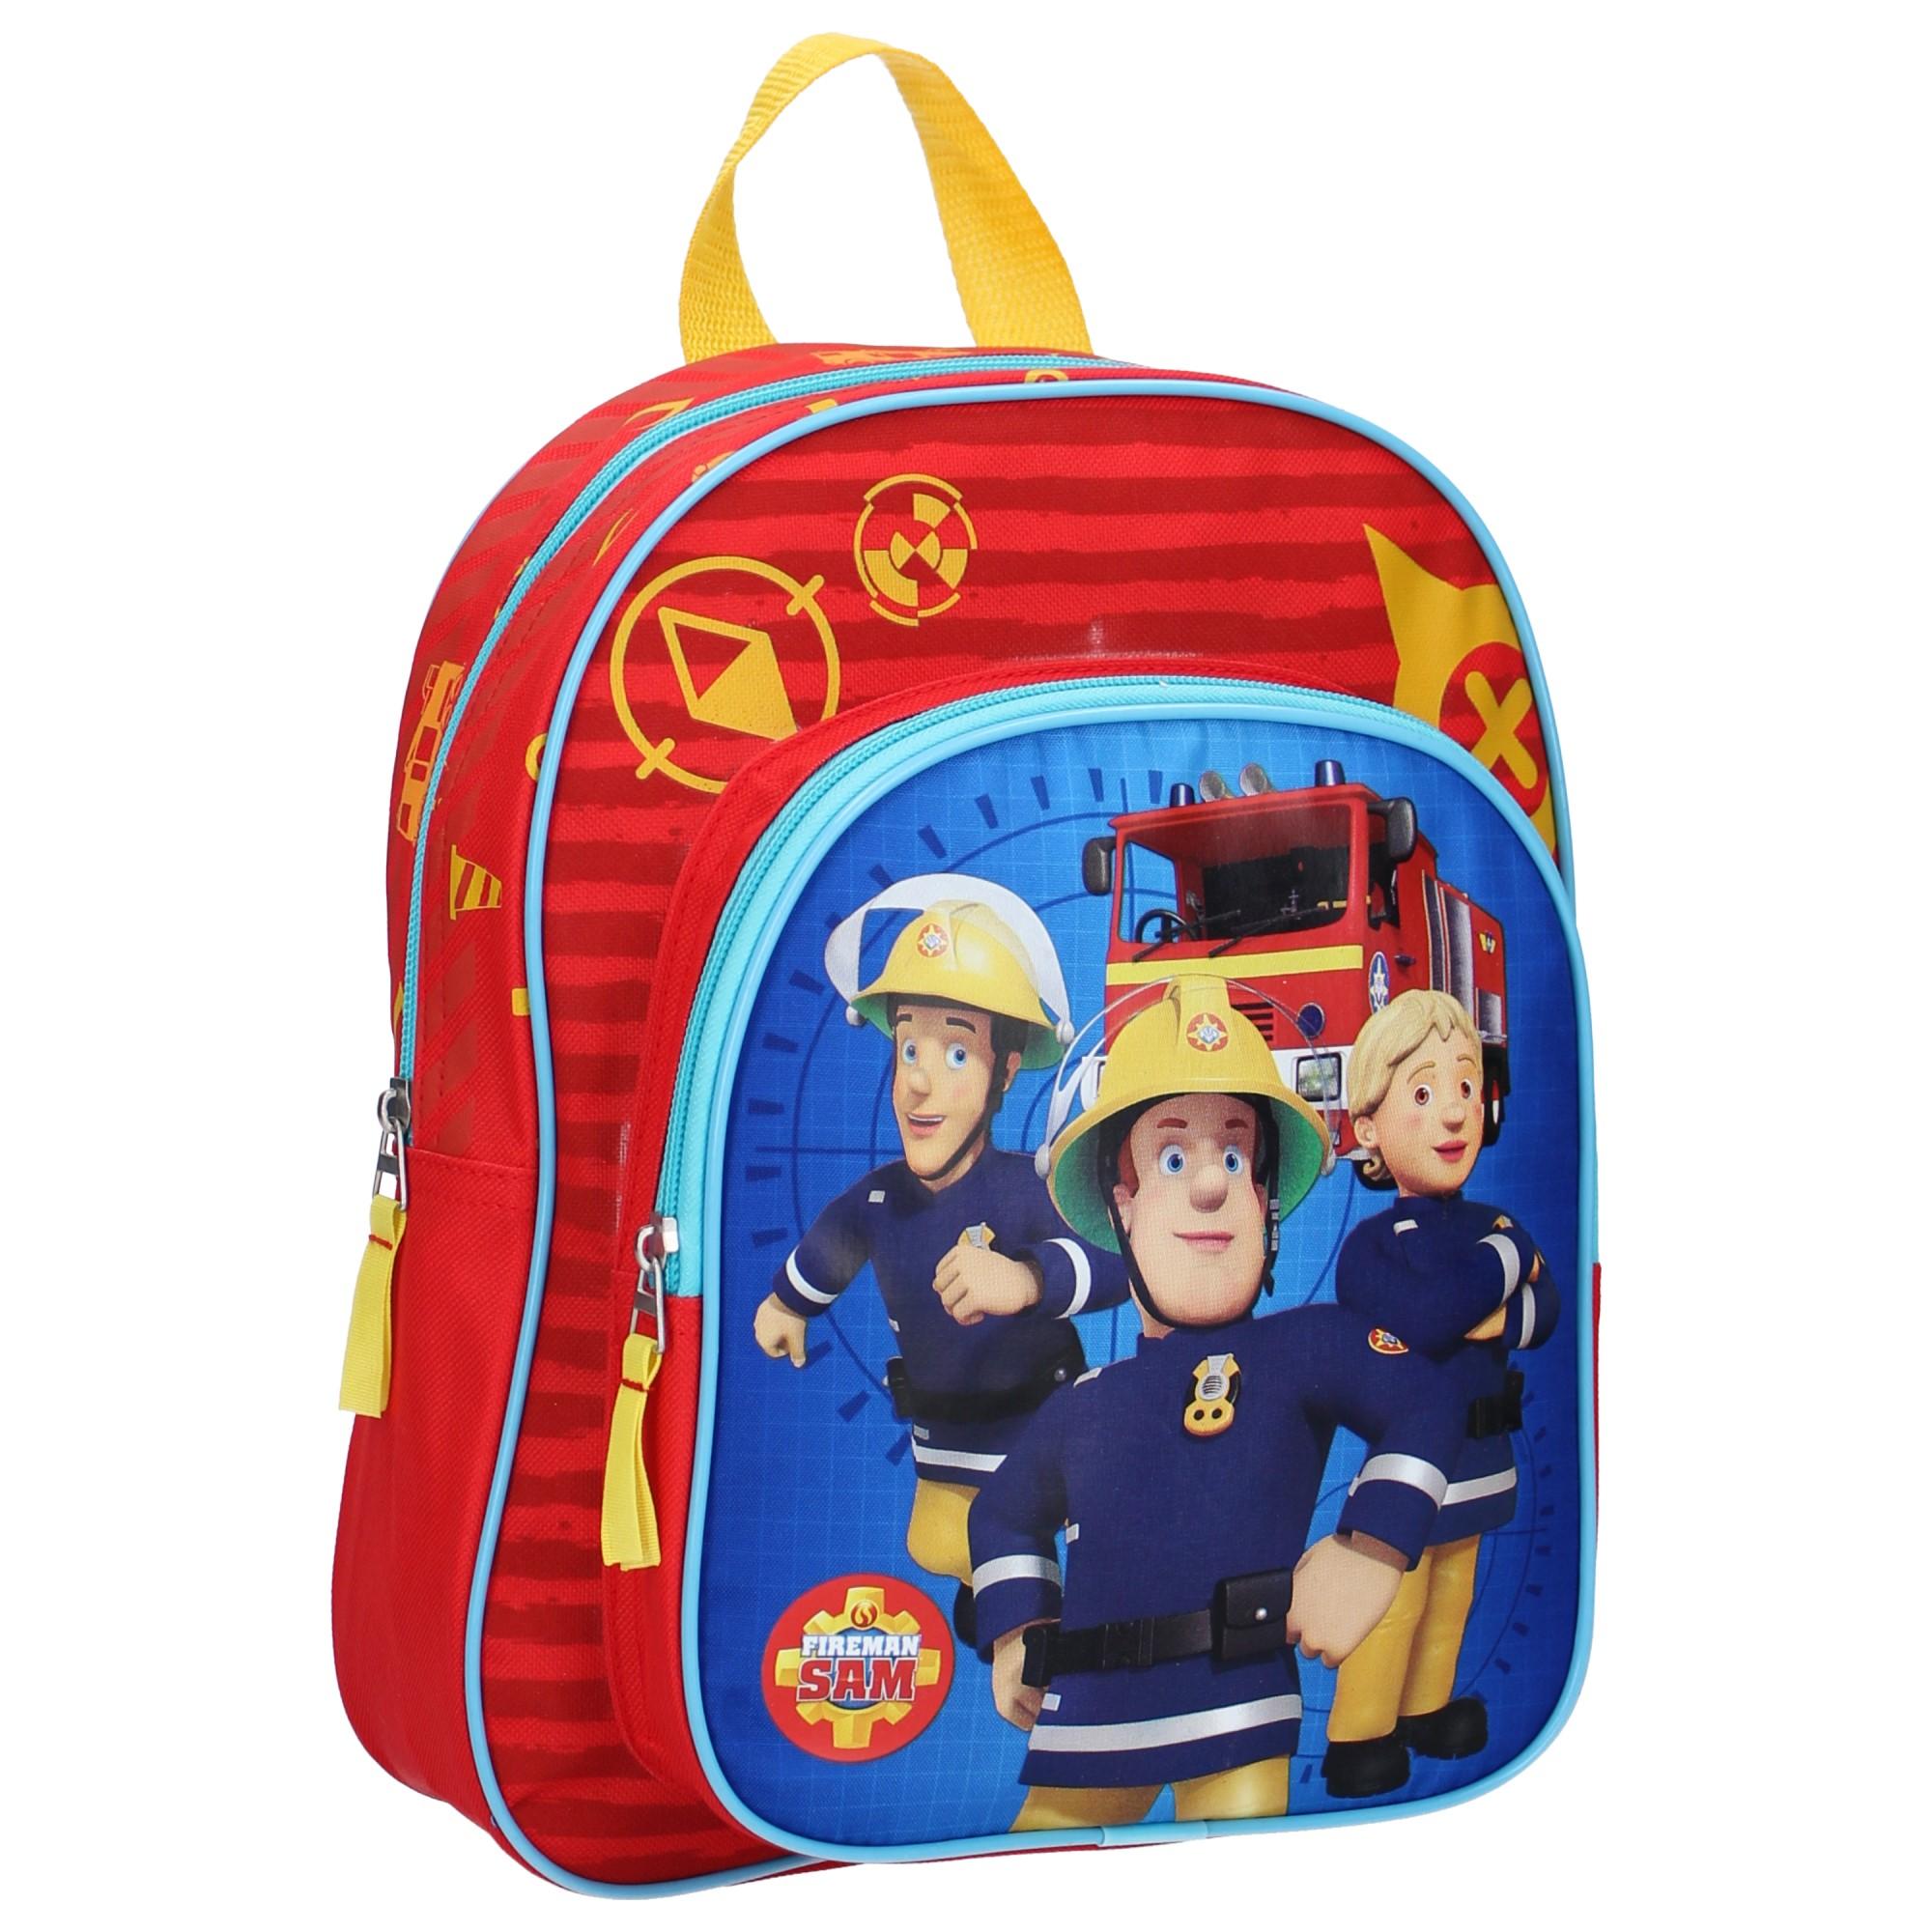 Fireman Sam Sac /à dos Sam le pompier